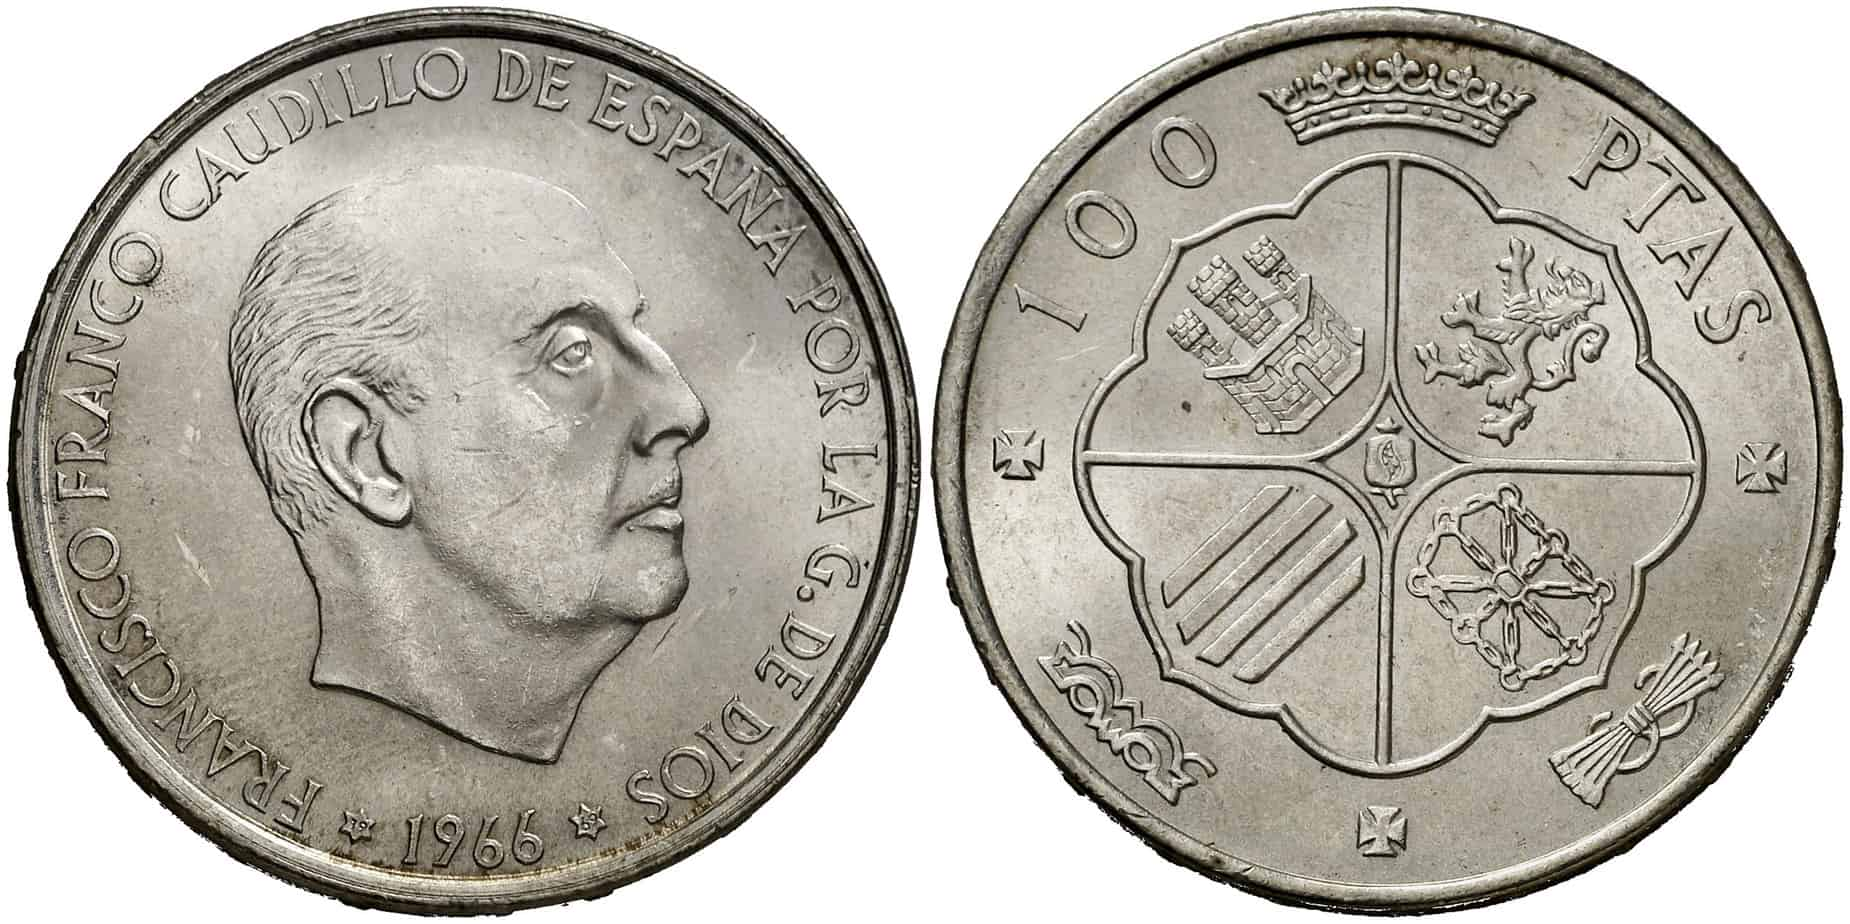 100 pesetas Franco